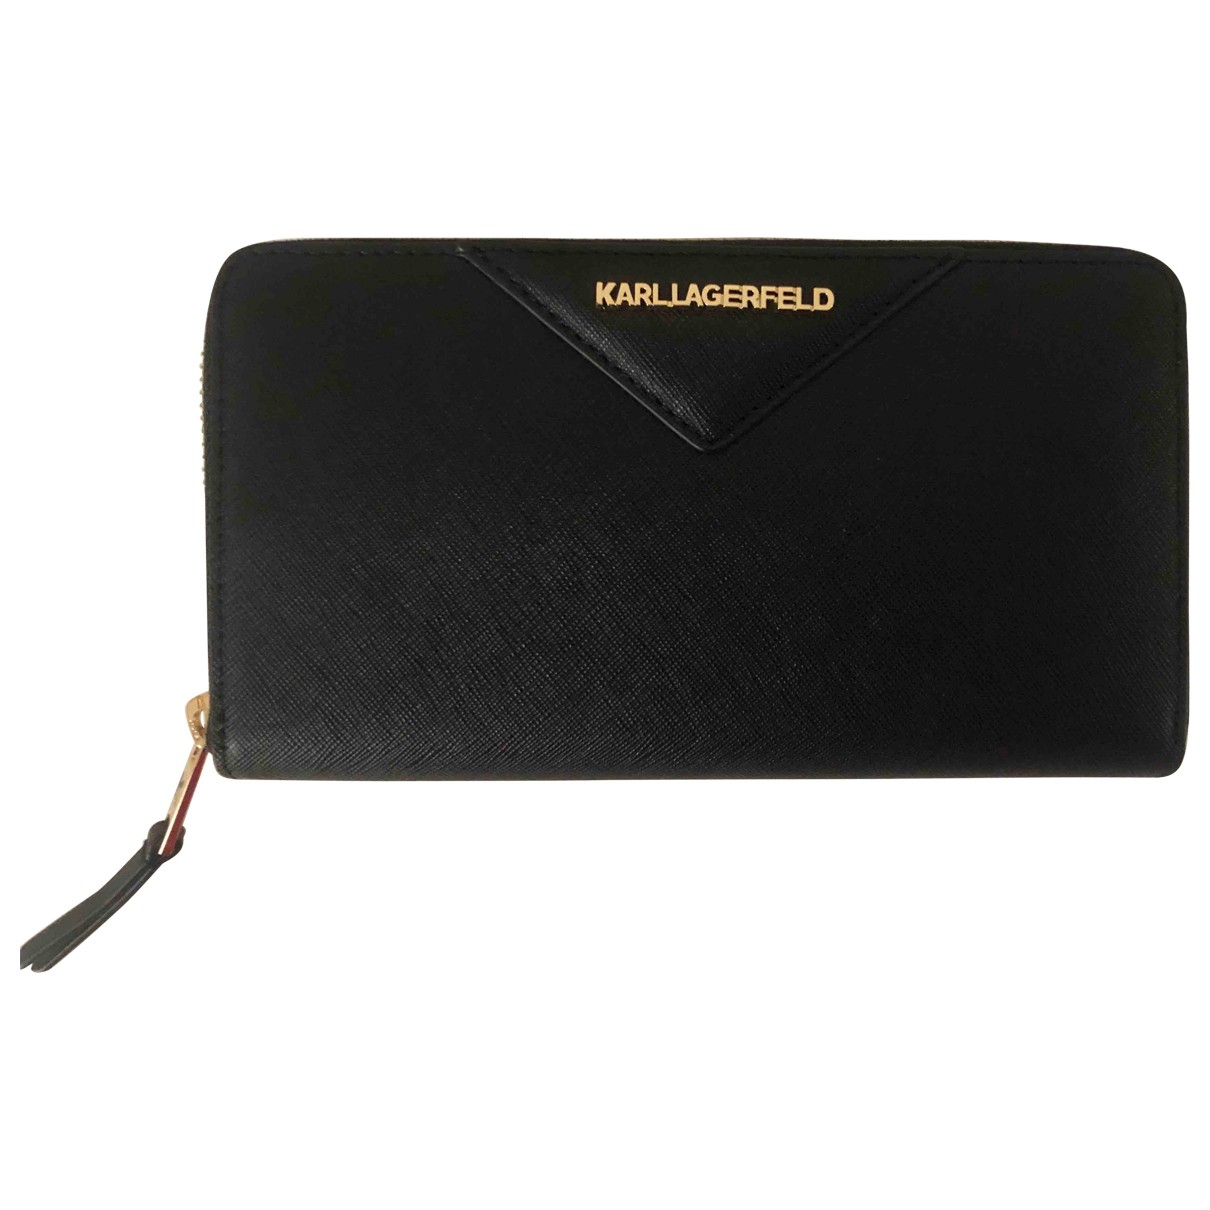 Karl Lagerfeld - Petite maroquinerie   pour femme en cuir - noir